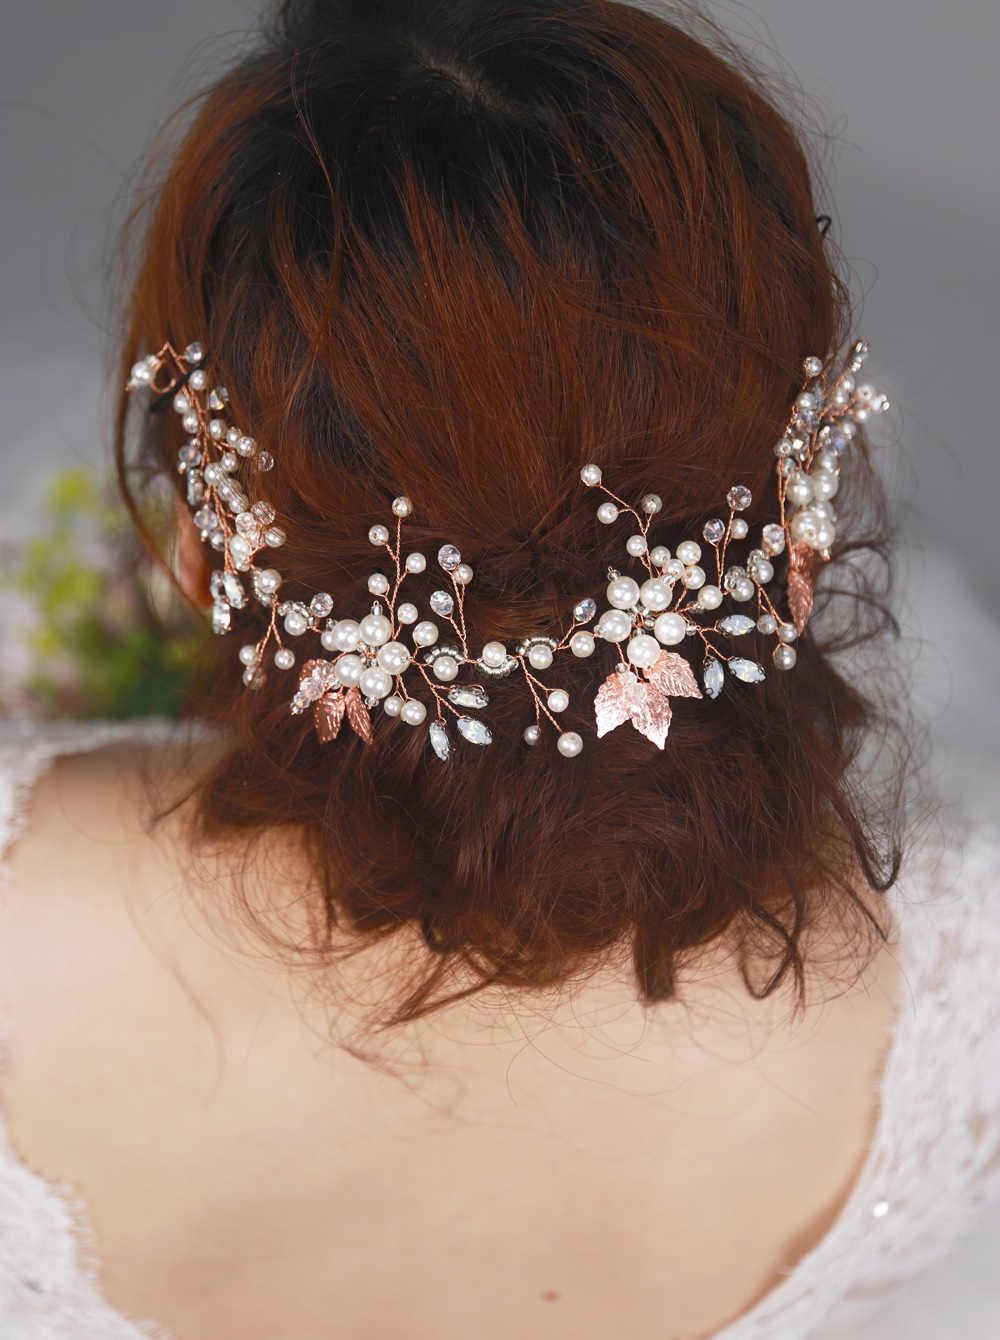 Rose Gold Bridal Hair Vine Crystal Leaf Rustic Bridal Headpieces Floral Bridal Wreath Wedding Hair Accessories Pearl Headband Tiara